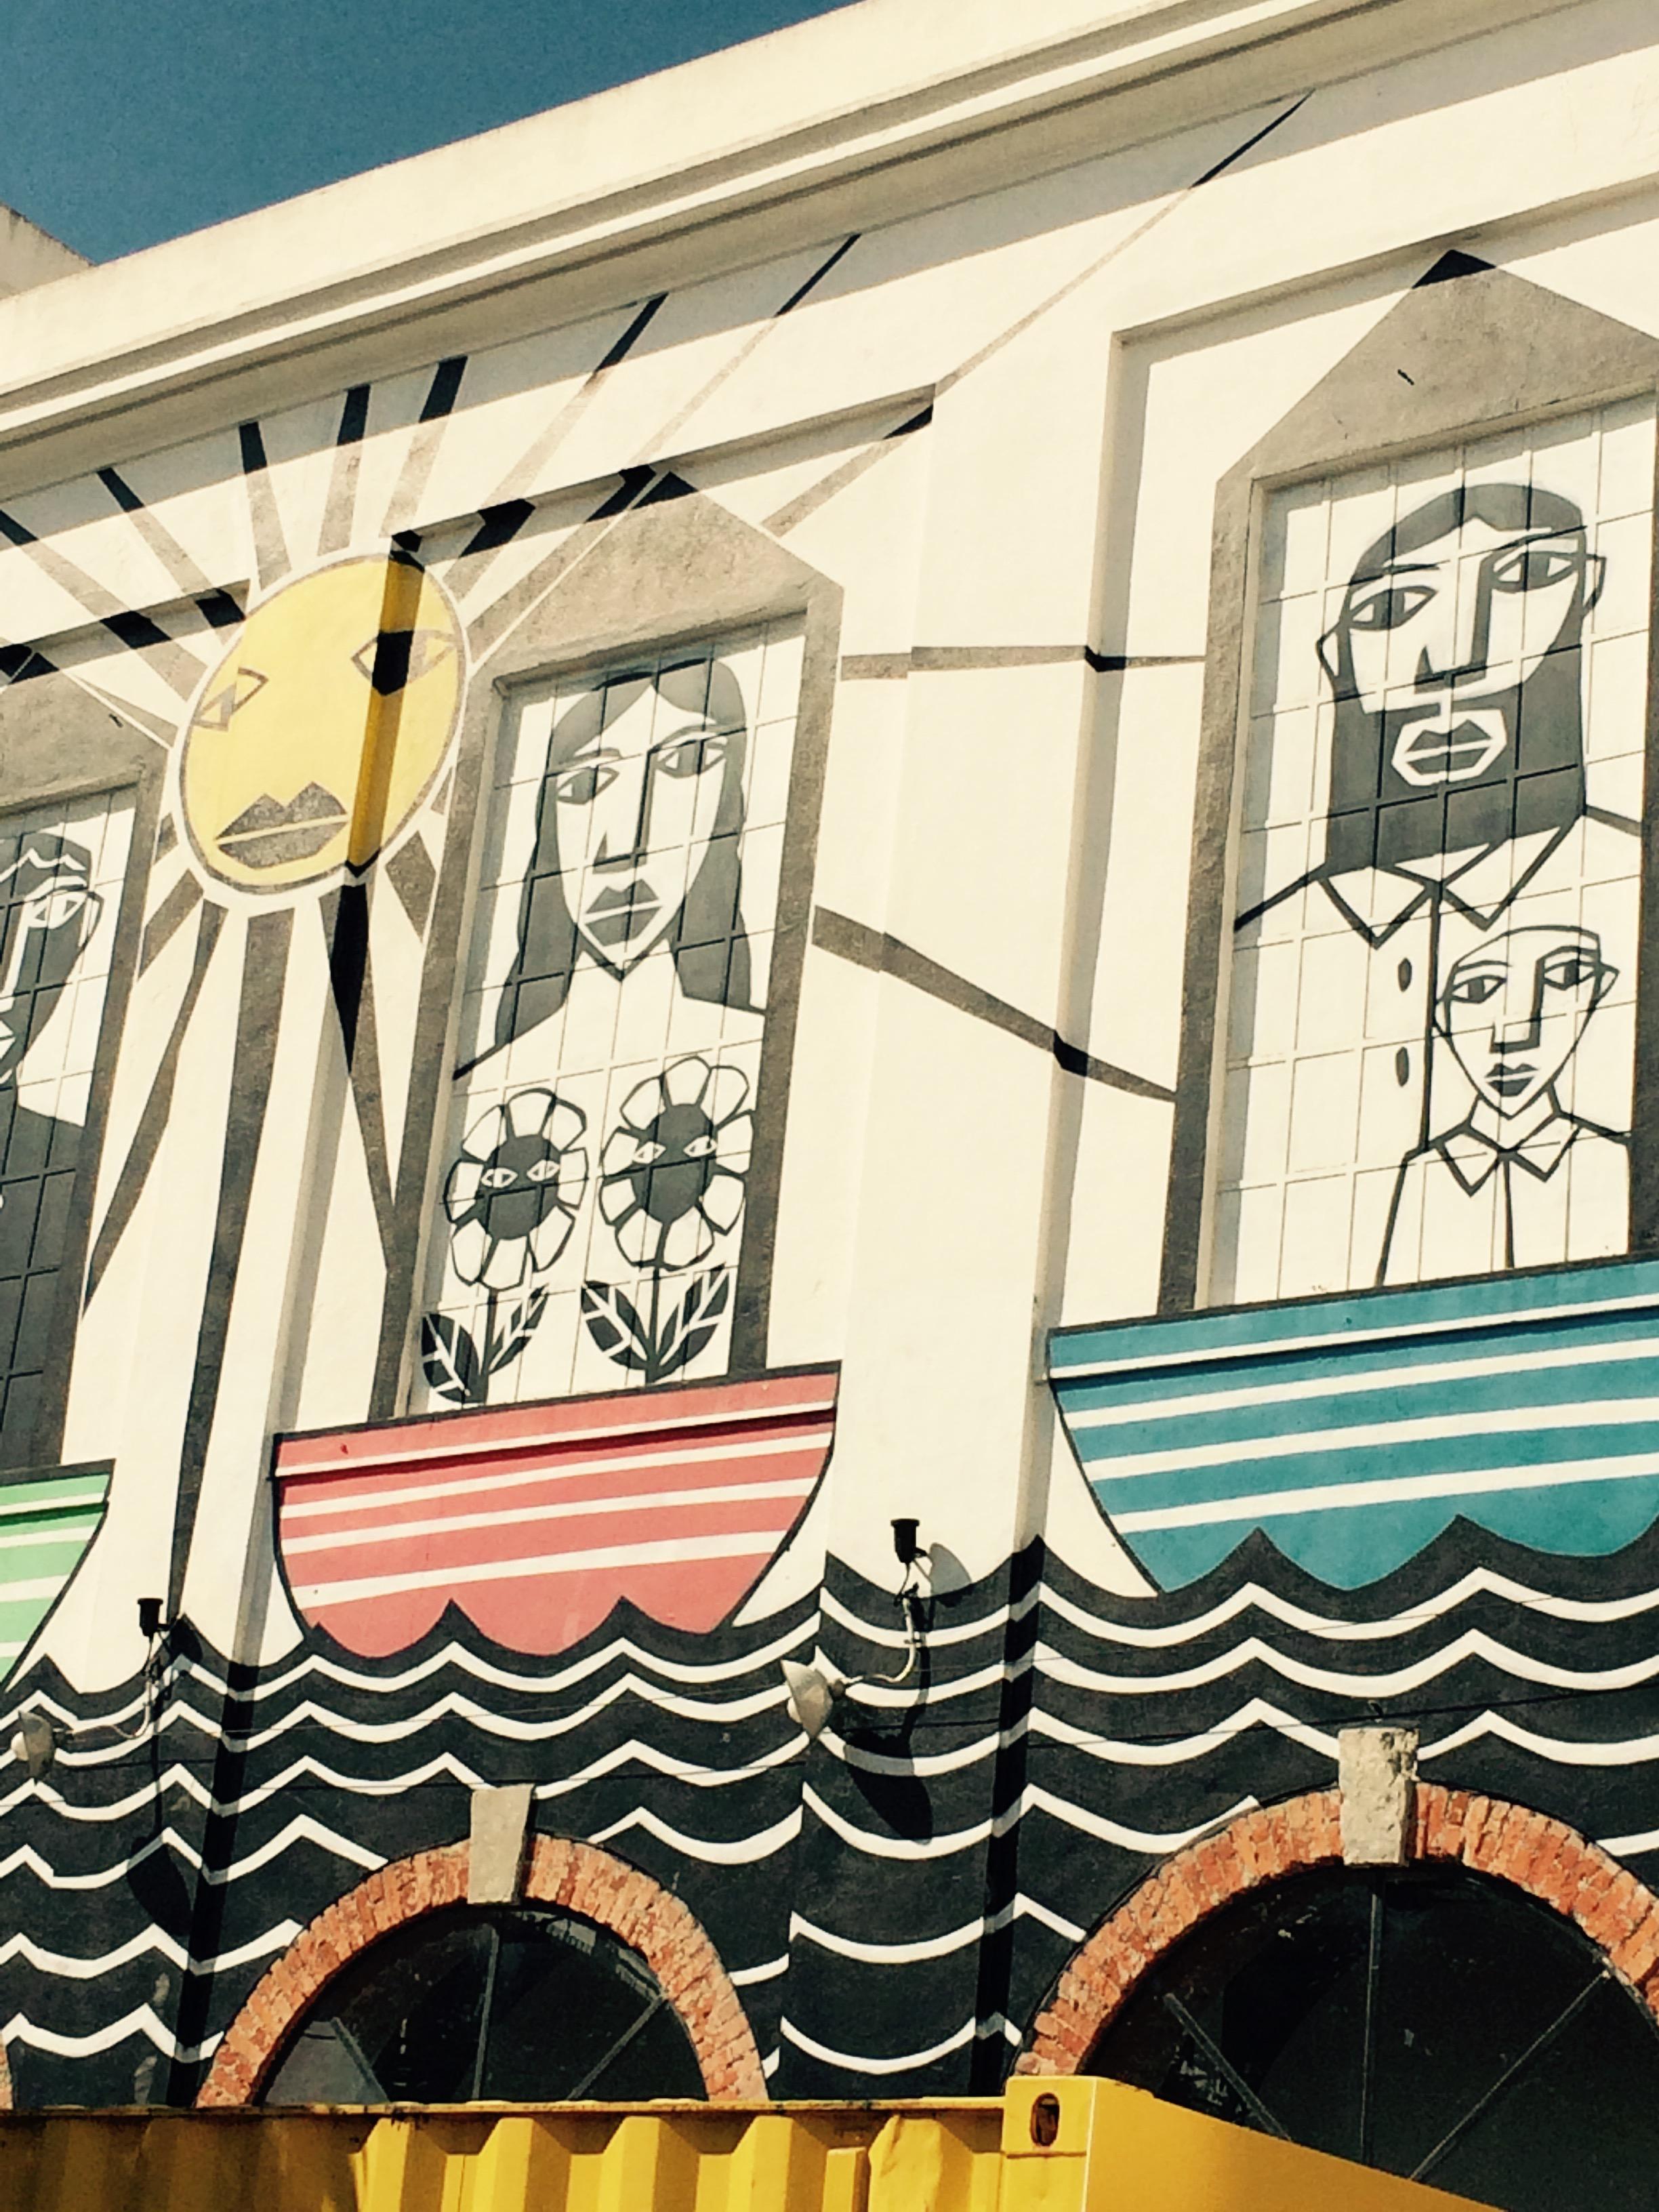 Outdoor building art © Nina Santos